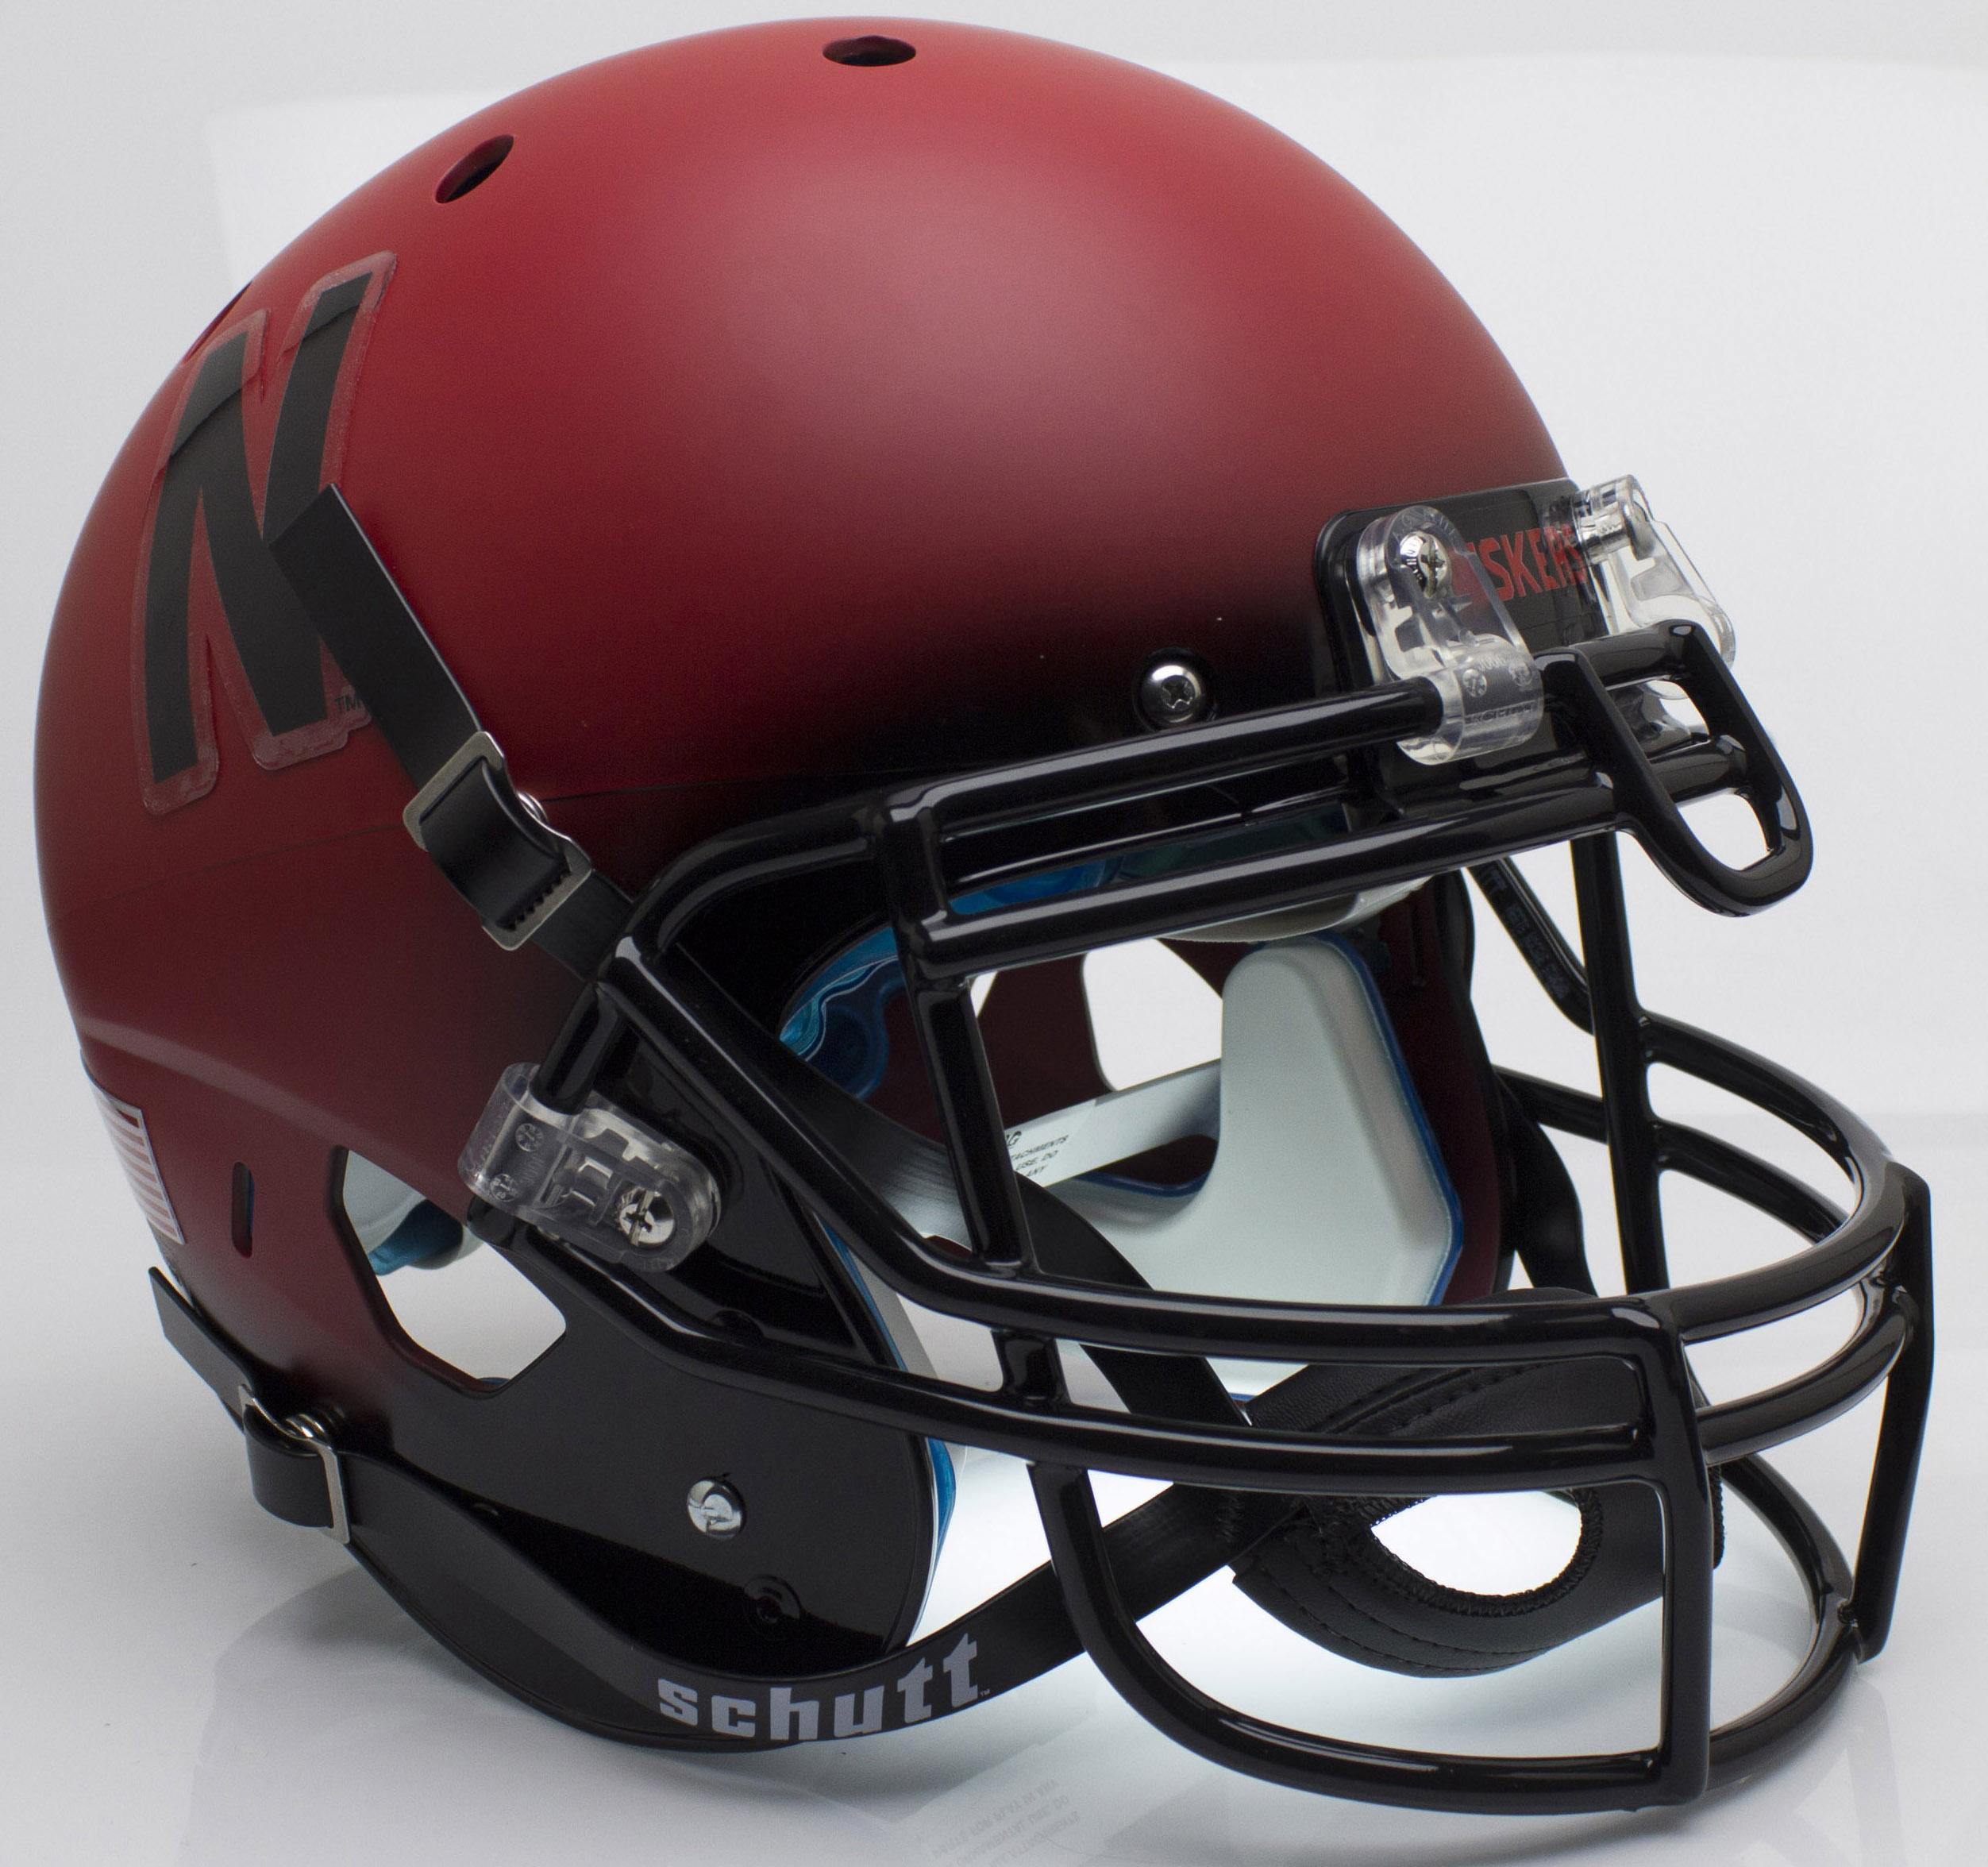 Nebraska Cornhuskers Authentic College XP Football Helmet Schutt <B>Red and Black</B>